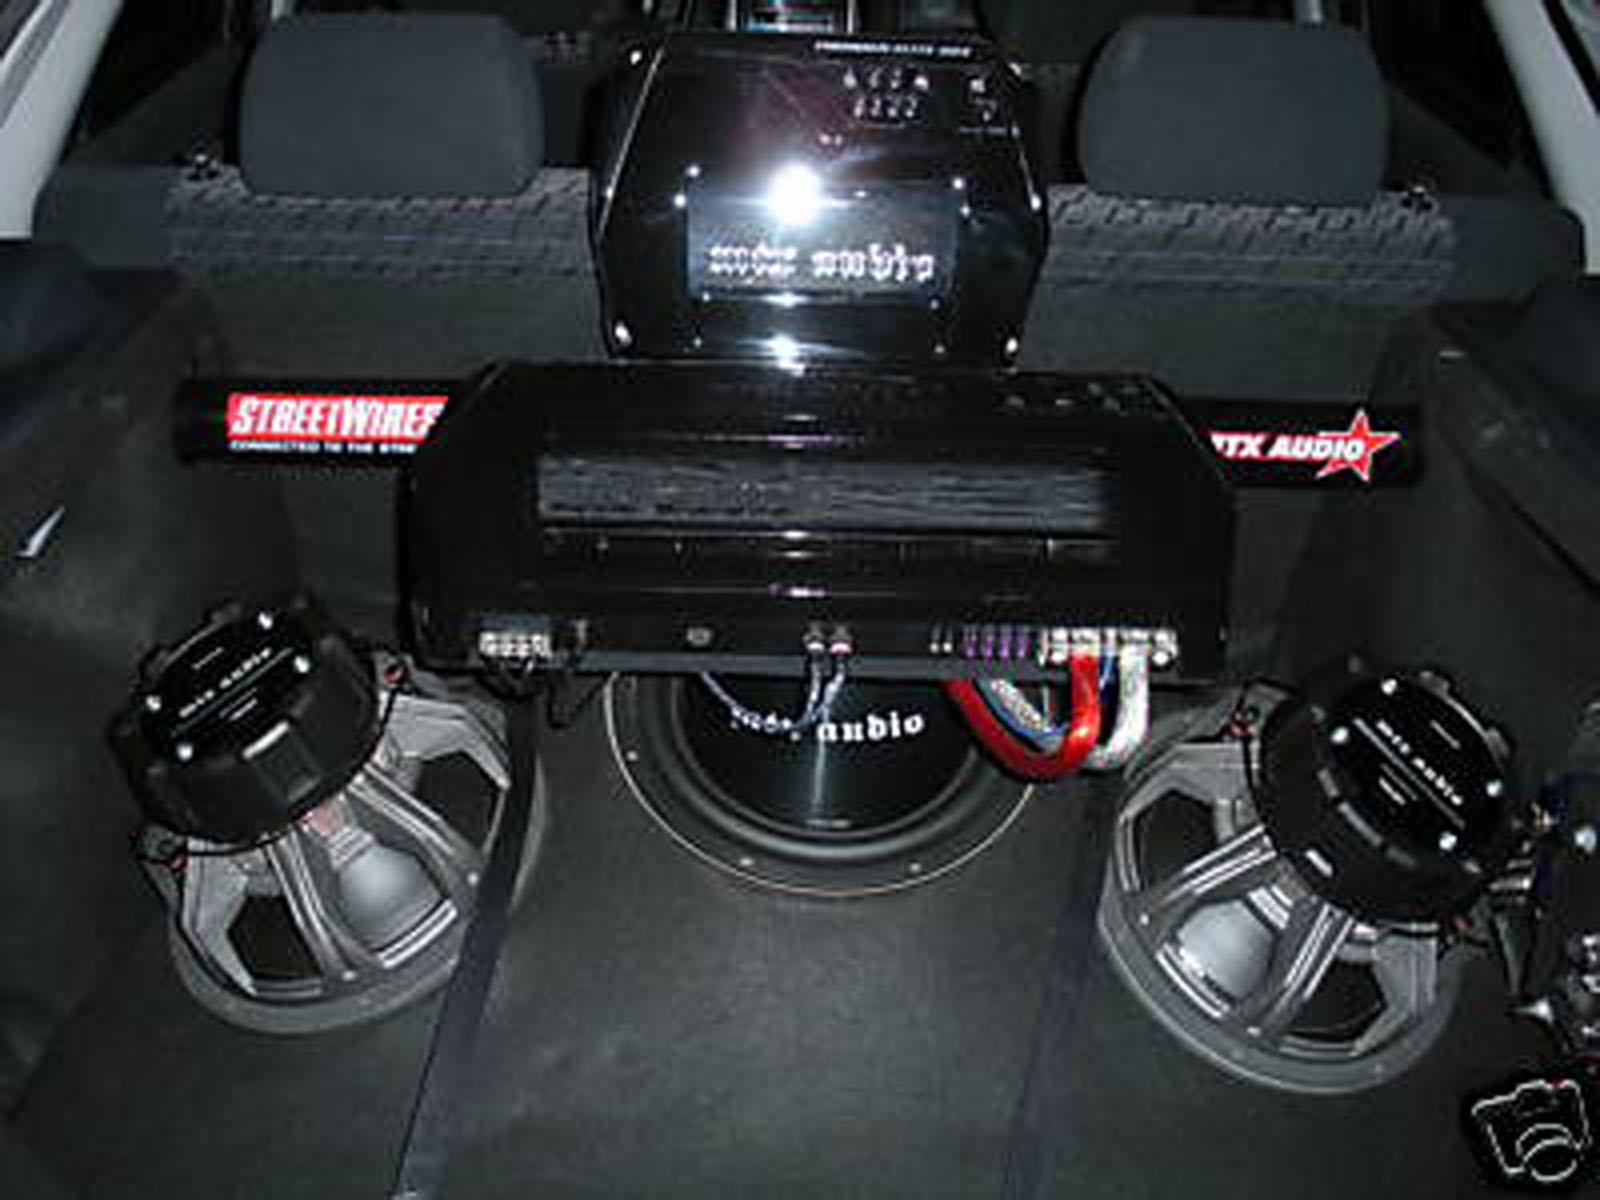 2002 mazda protege5 for sale riverview michigan rh modifiedcartrader com 2002 mazda protege5 repair manual 2002 Mazda Protege Hatchback